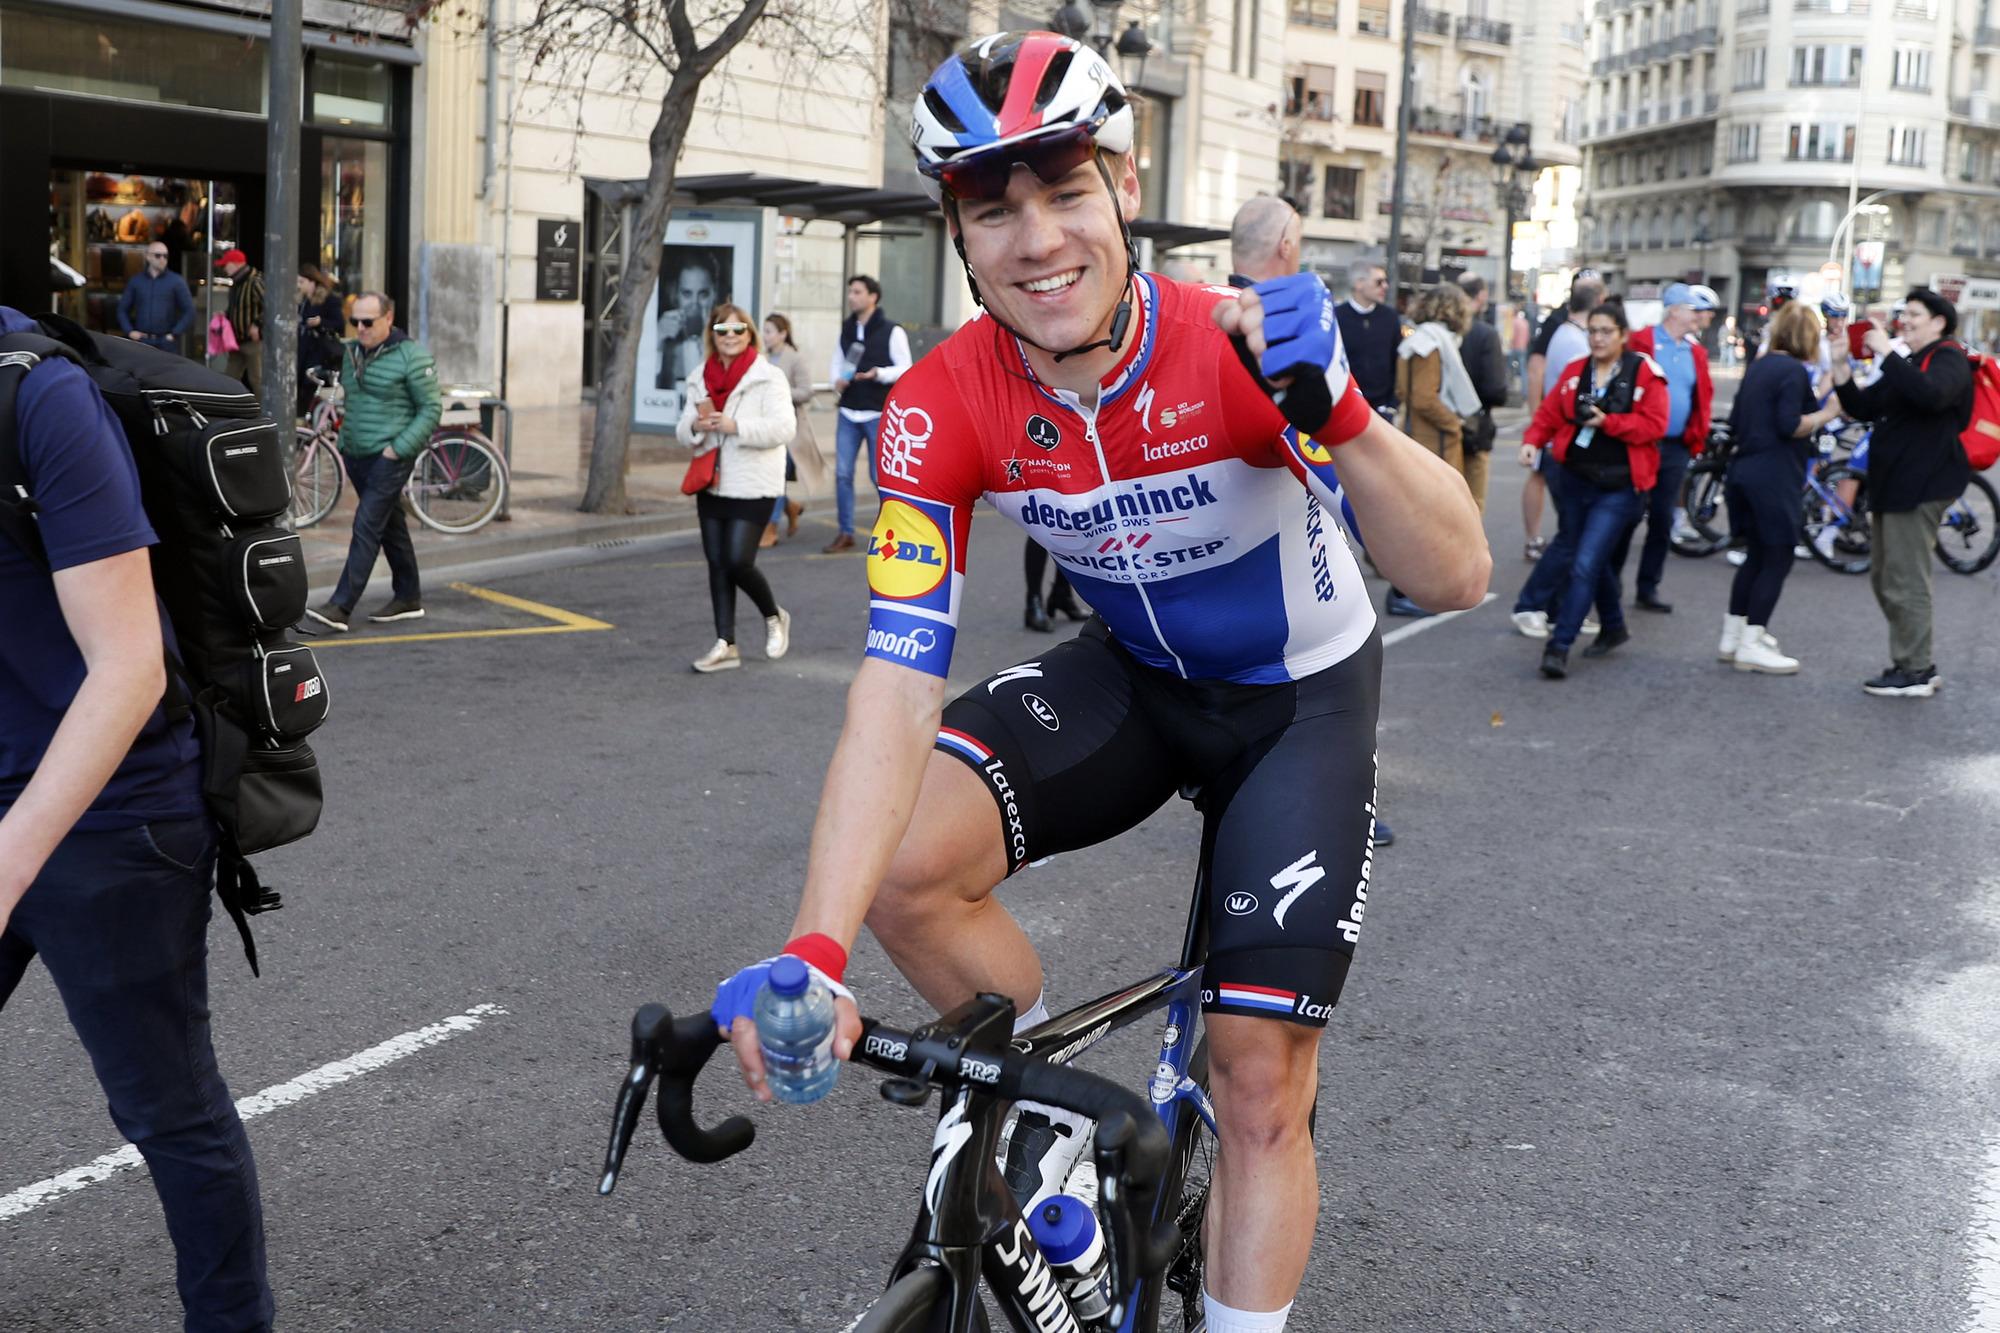 Volta a la Comunitat Valenciana 2020 - 71st Edition - 5th stage Paterna - Valencia 97,7 km - 09/02/2020 - Fabio Jakobsen (NED - Deceuninck - Quick Step) - photo Luis Angel Gomez/BettiniPhoto©2020